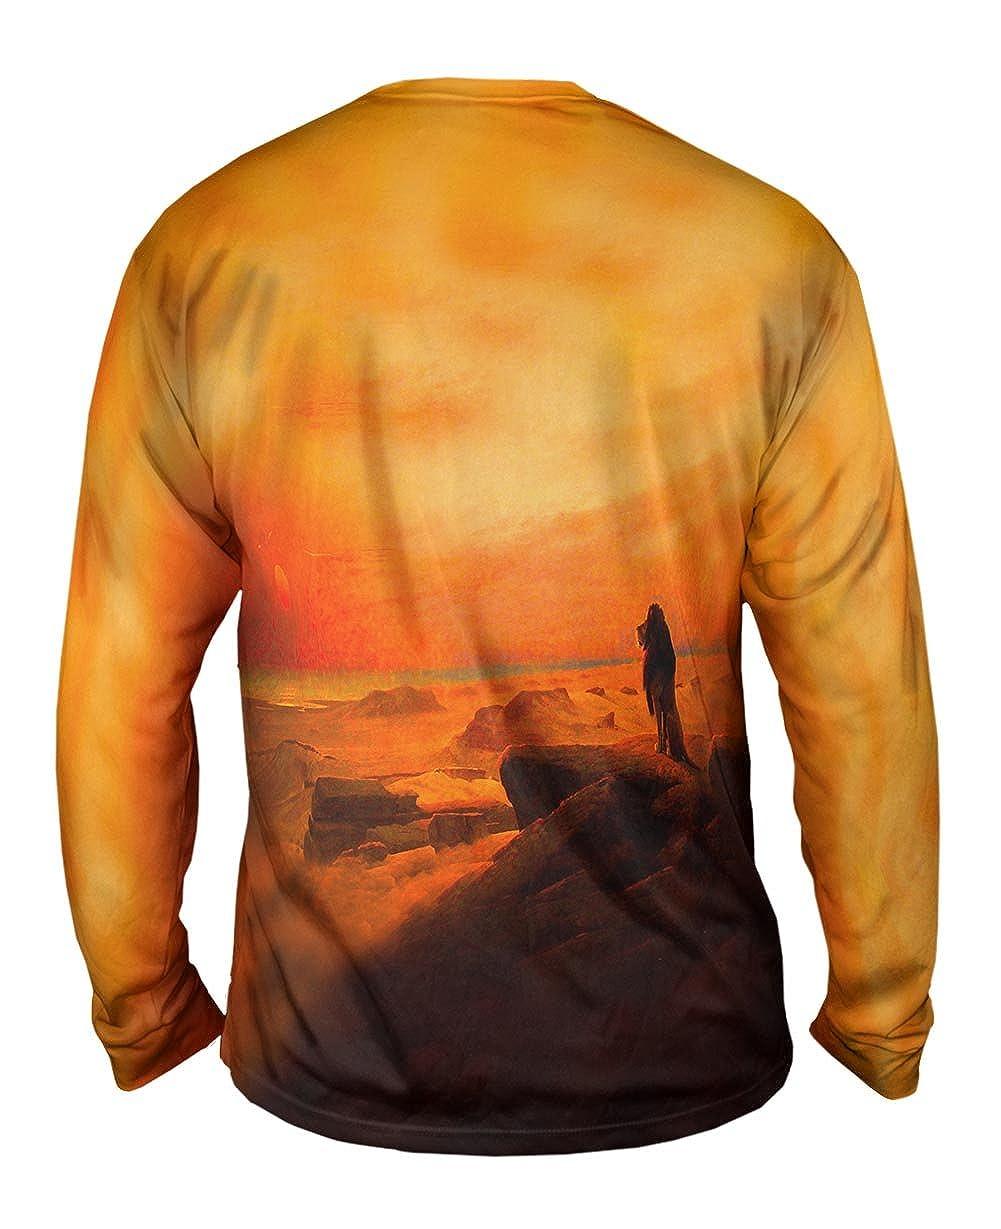 Yizzam- Jean-Leon Gerome The Two Majesties -TShirt- Mens Long Sleeve 1883